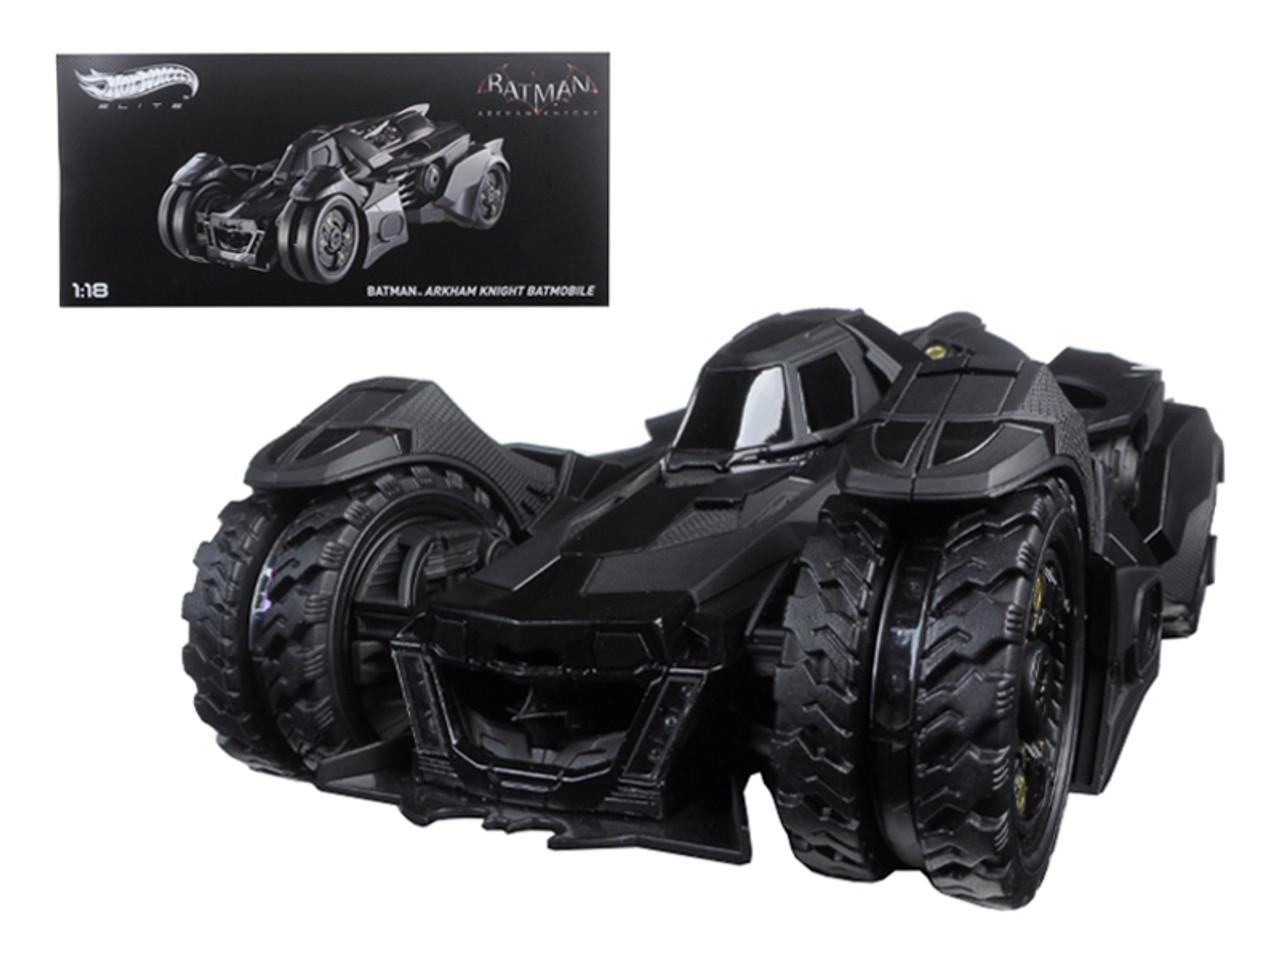 1/18 Hot Wheels Hotwheels Elite Batman Arkham Knight Batmobile Elite Edition Diecast Car Model